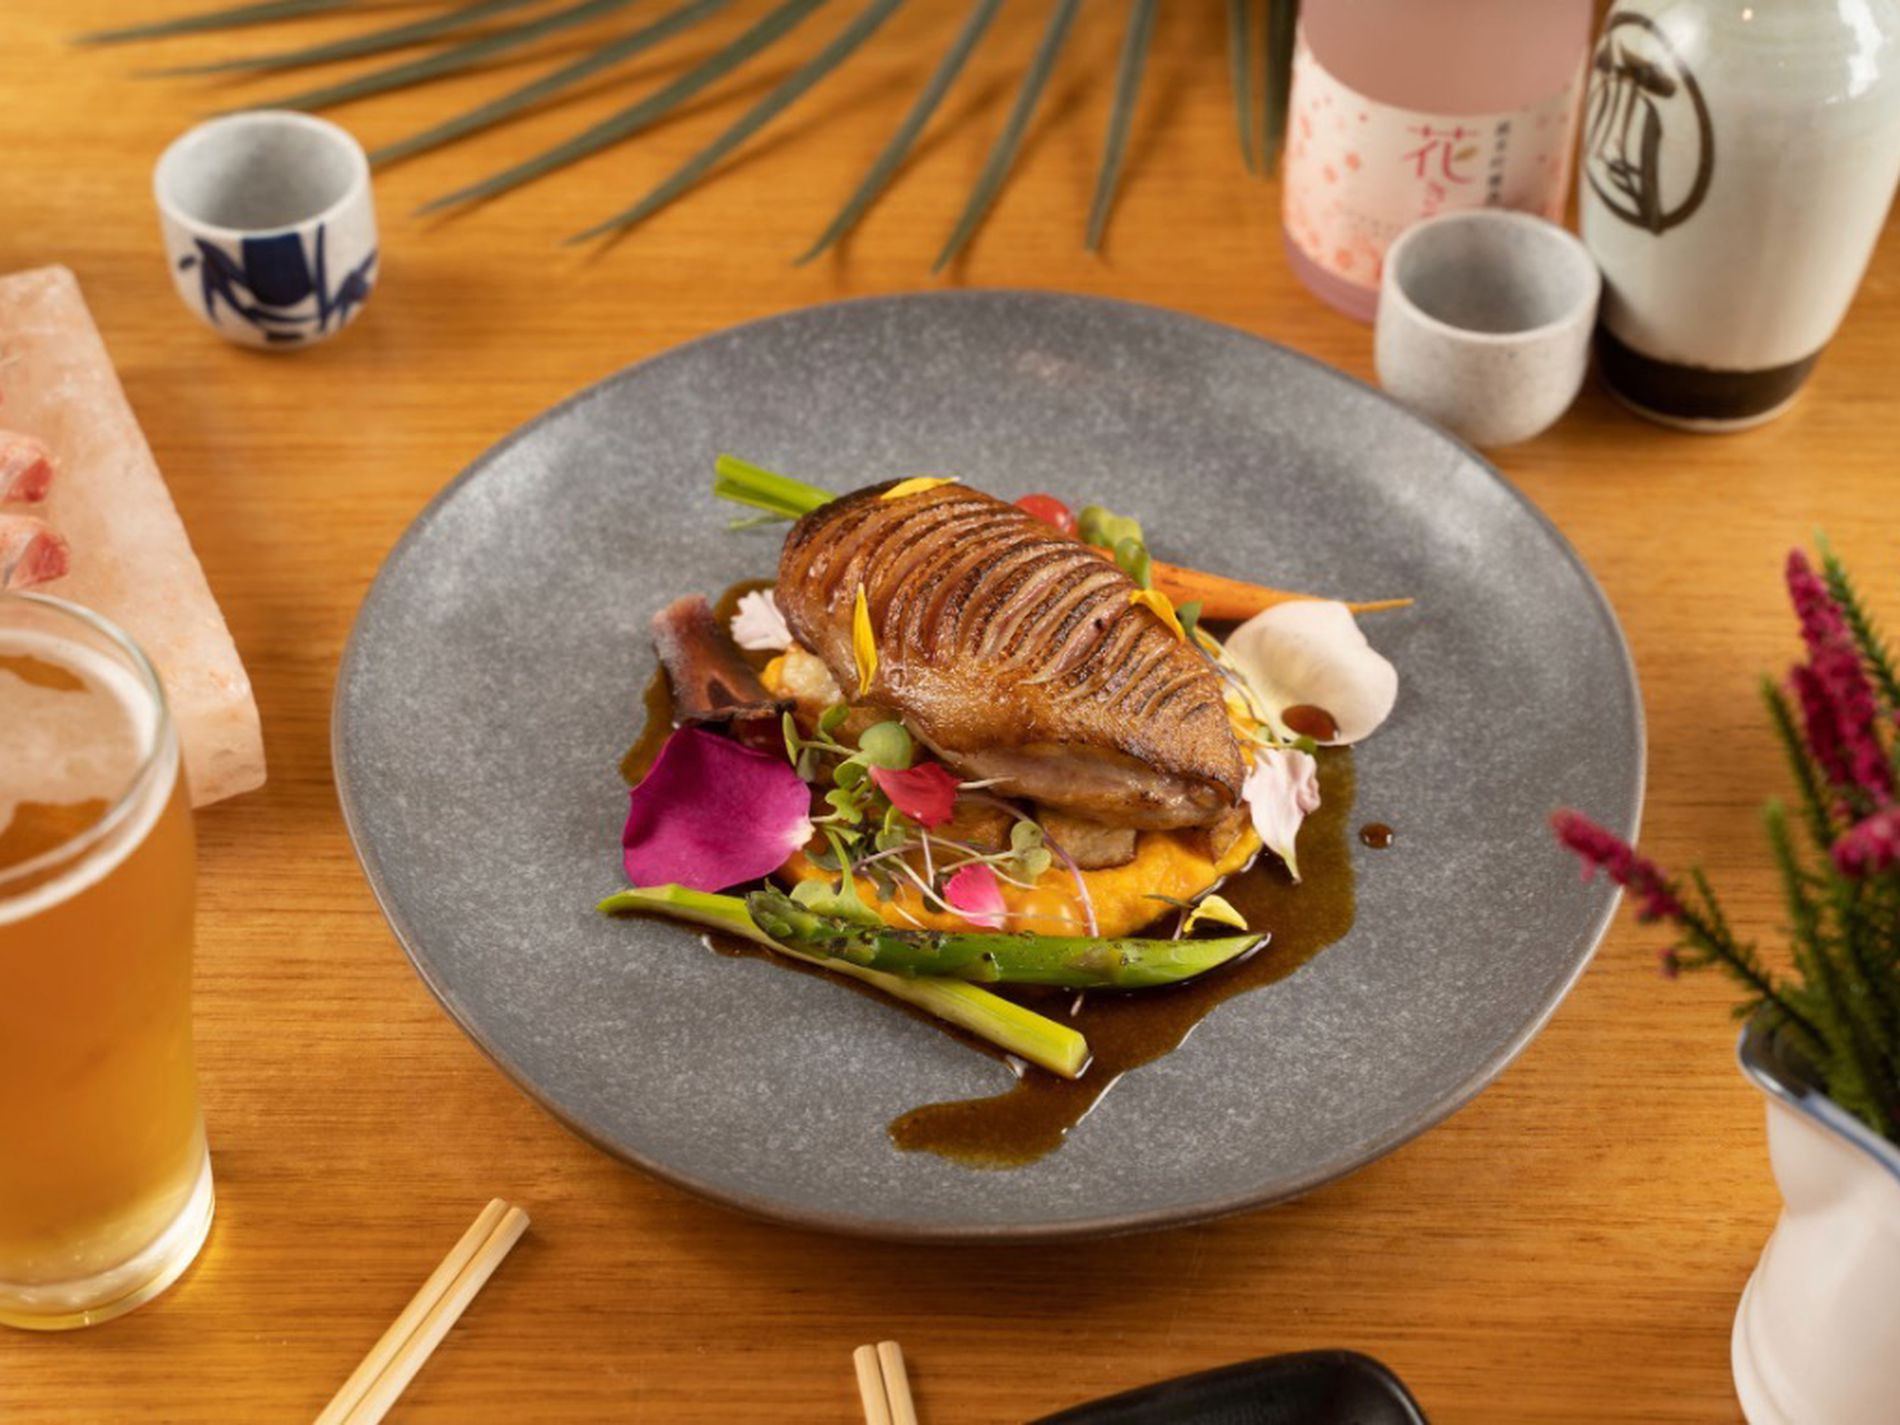 Asian Restaurant Business For Sale Prestigious Bayside Suburb